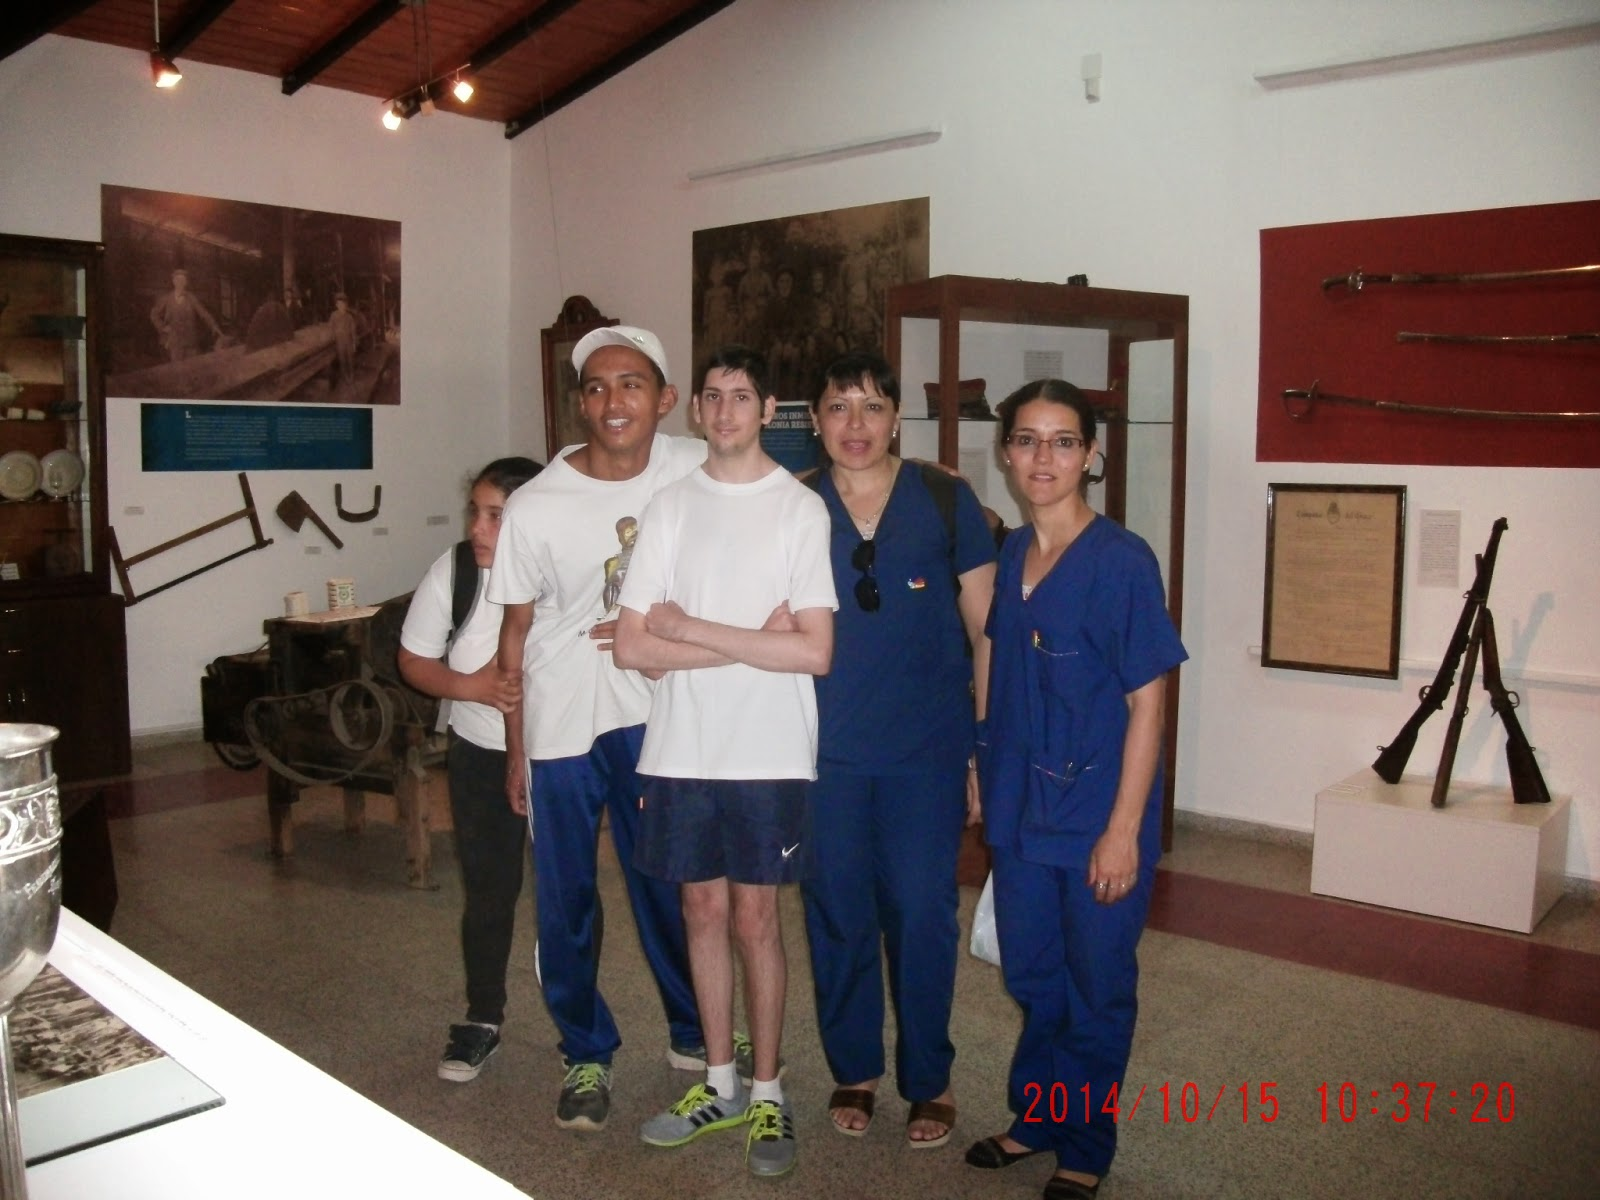 Ichoalay, Visita, Escuela